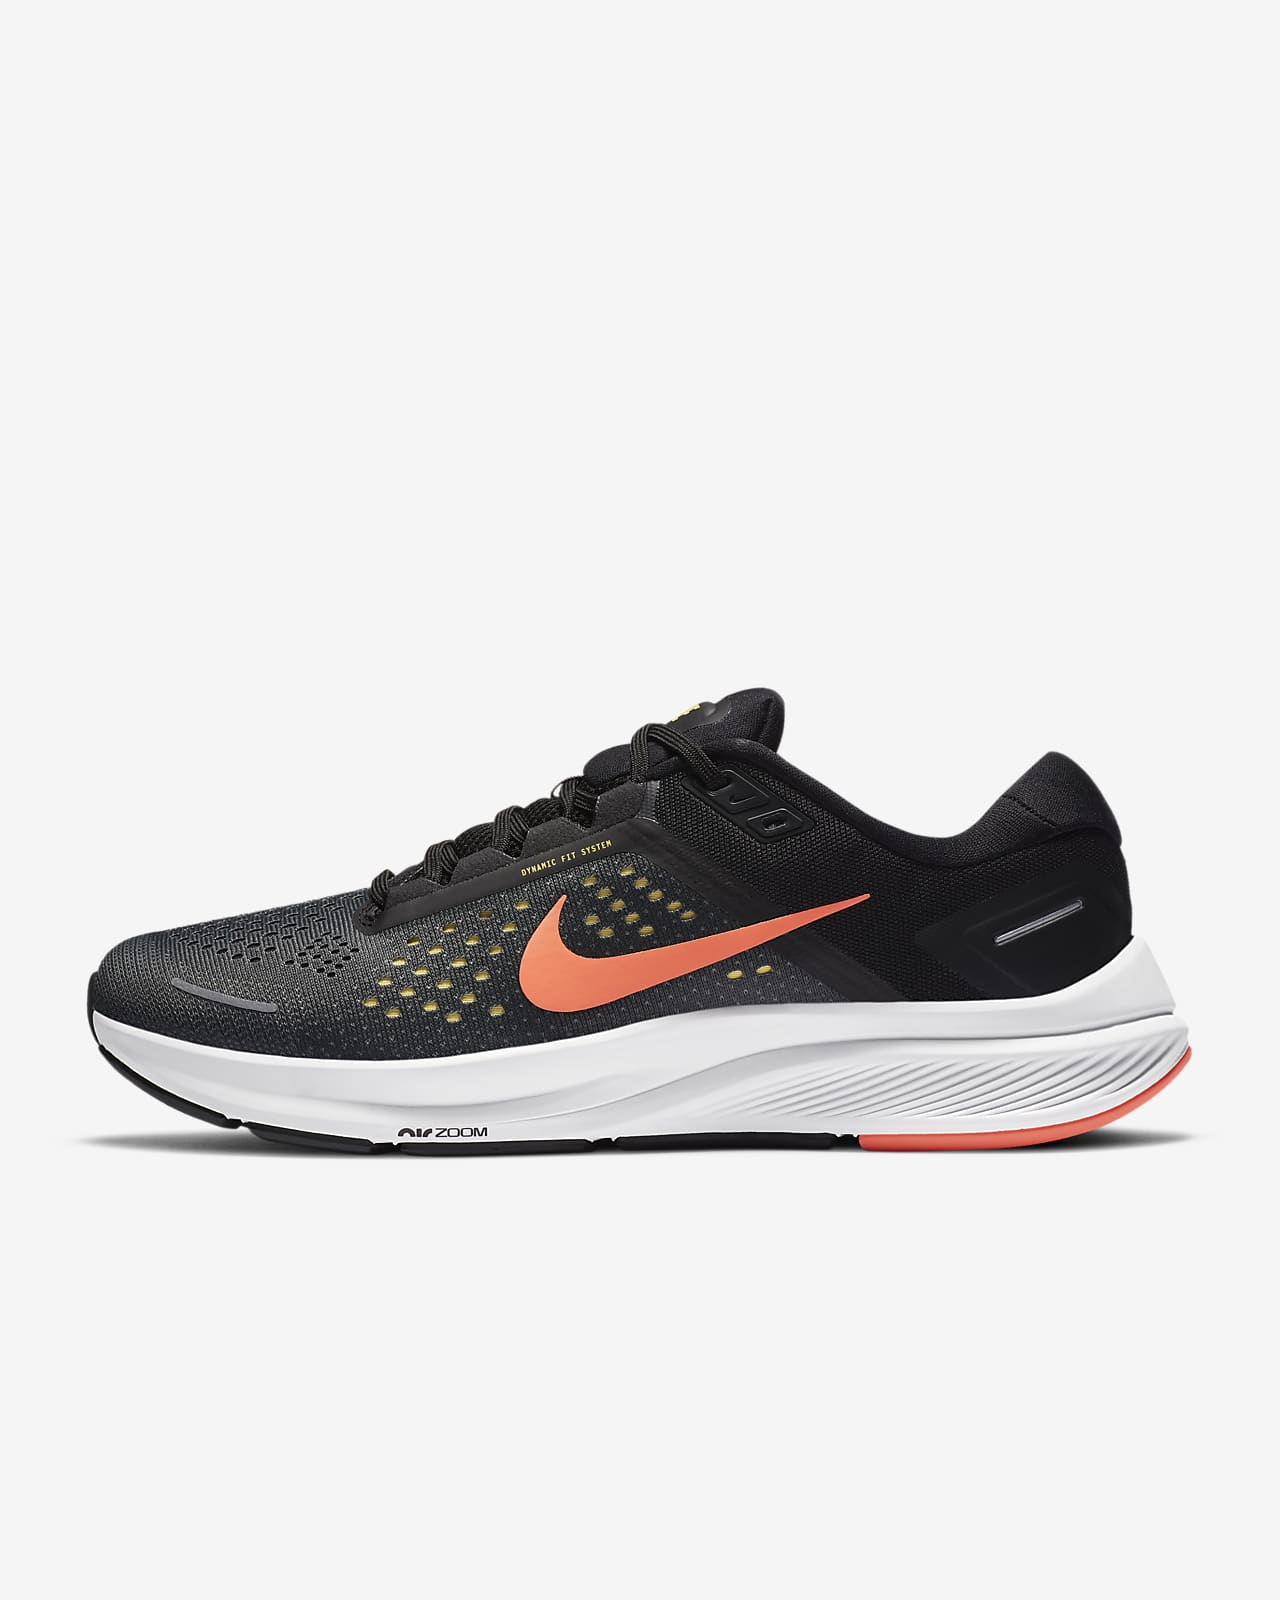 Nike Air Zoom Structure 23 男子跑步鞋